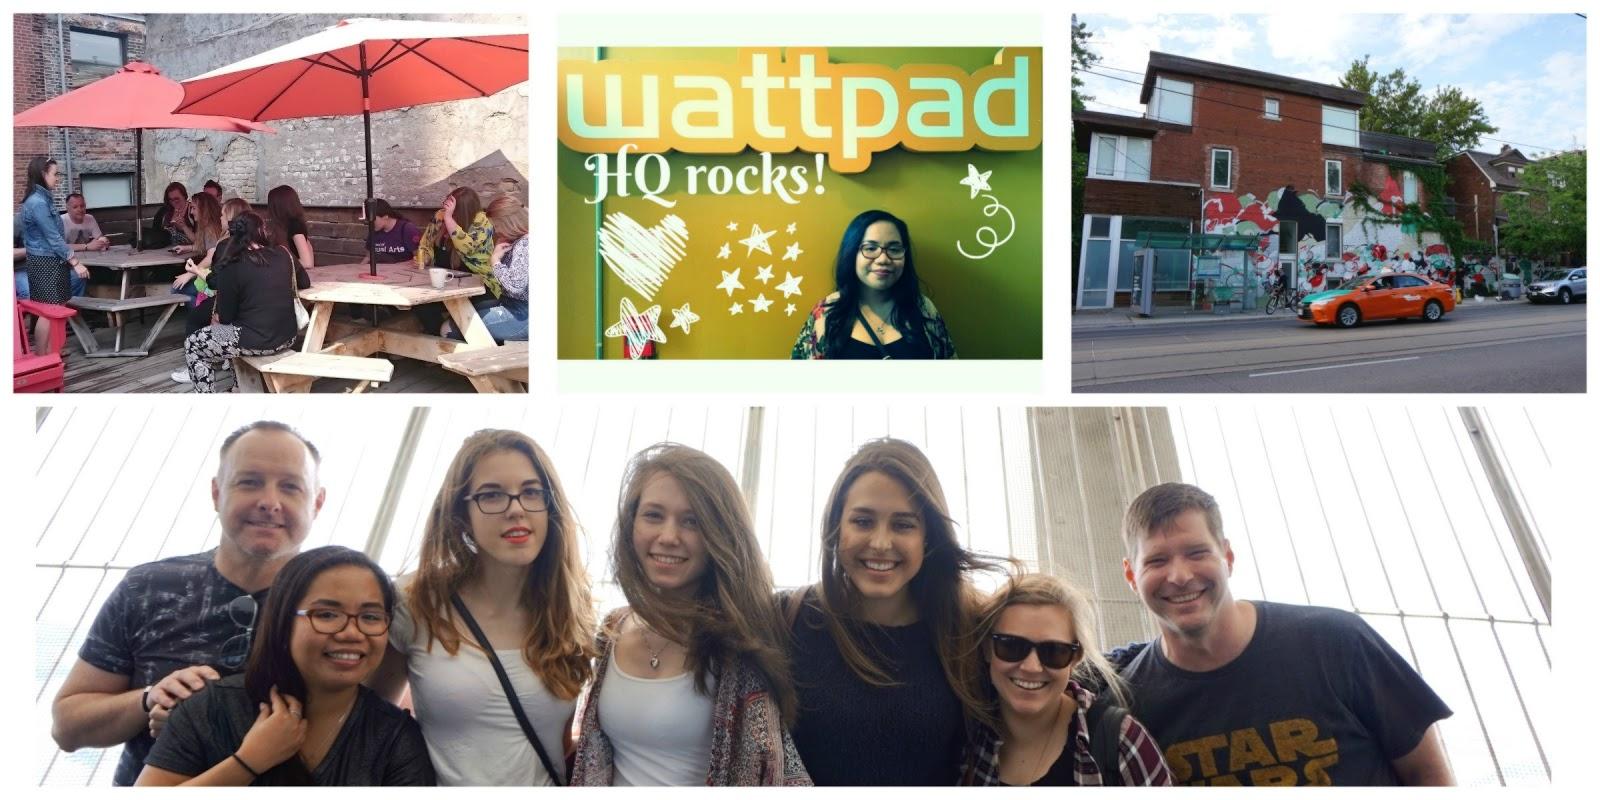 Wattpad Stars Invade the WP Headquarters | Ninya Tippett